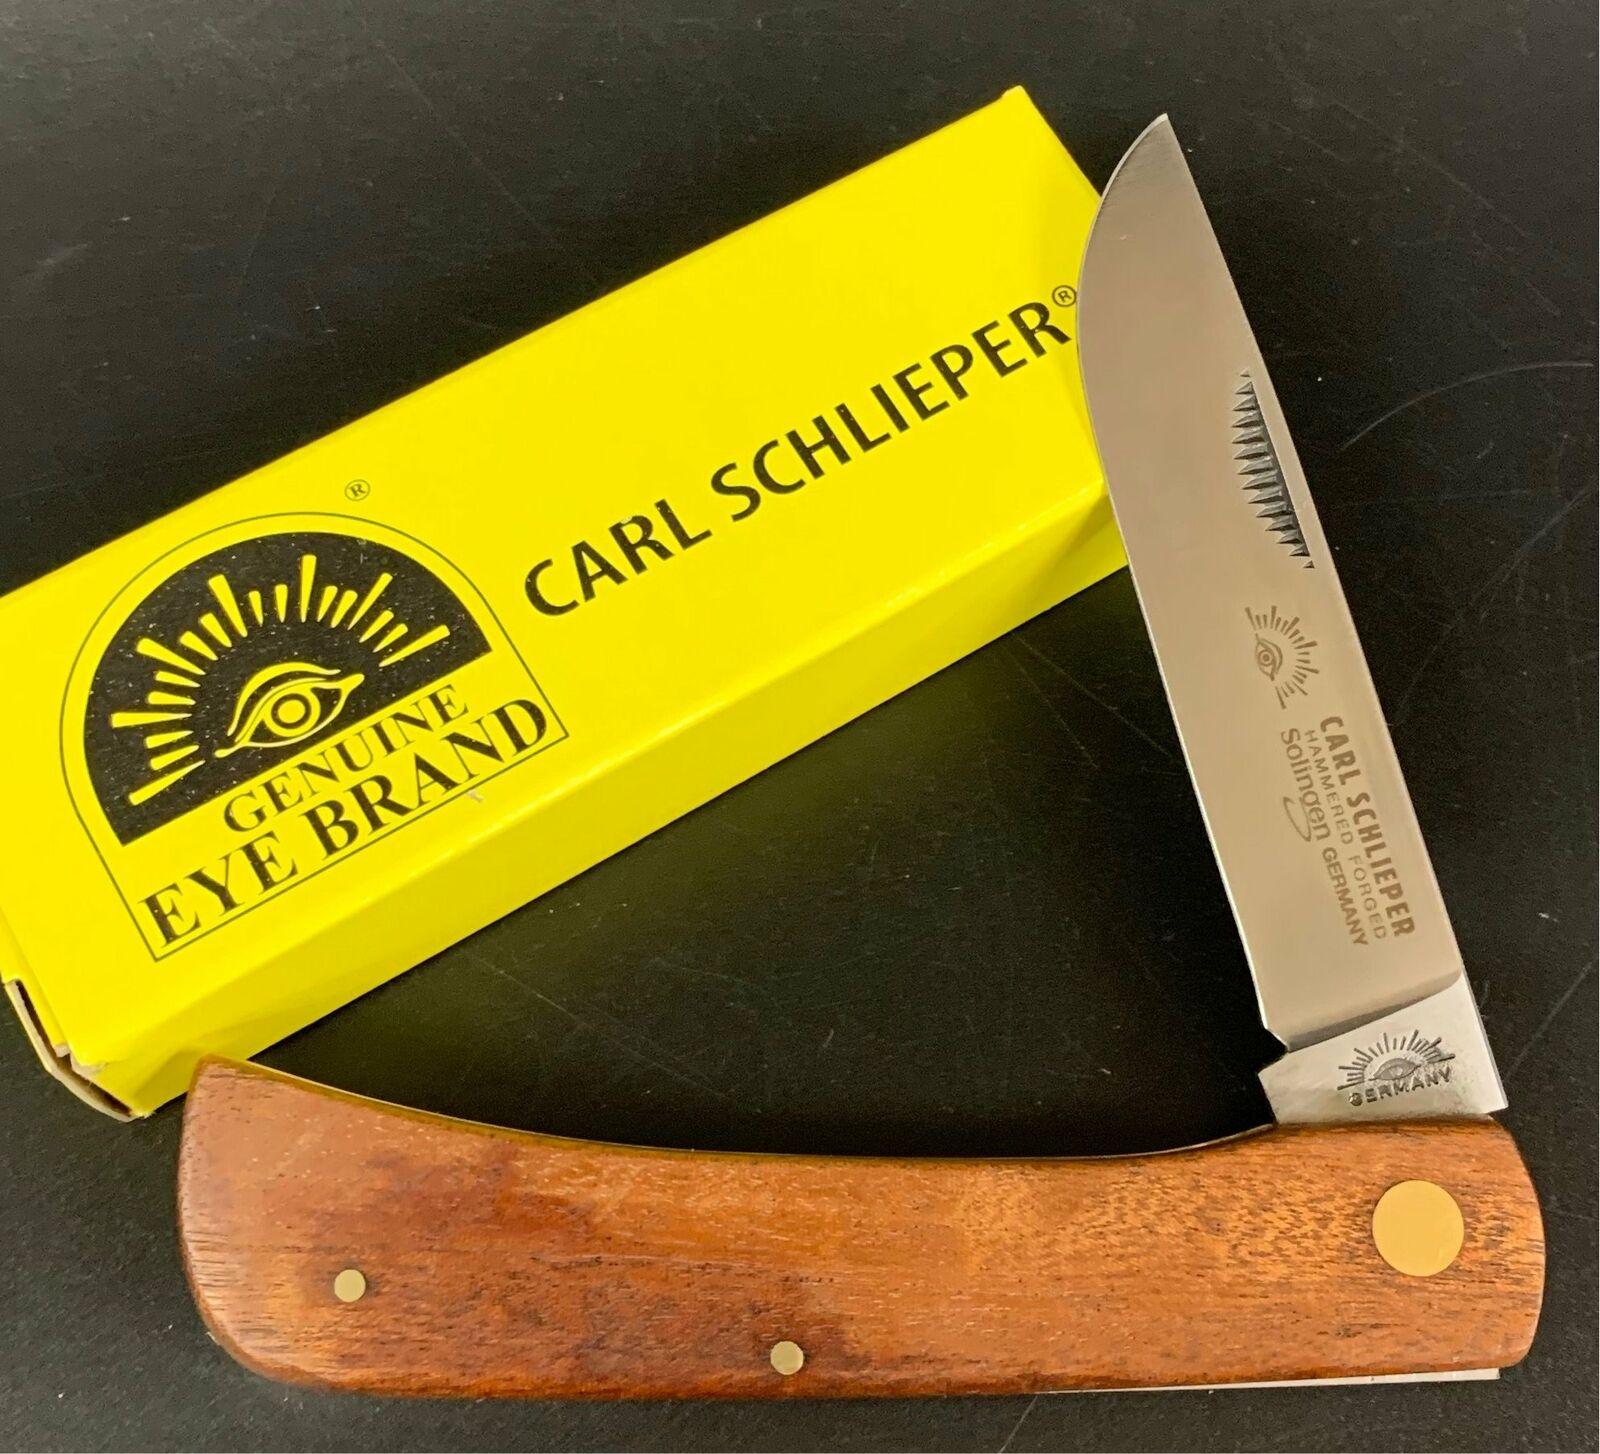 GERMAN EYE BRAND CUTLERY POCKET KNIFE - #GE99 CLODBUSTER LARGE SOD BUSTER GERMAN